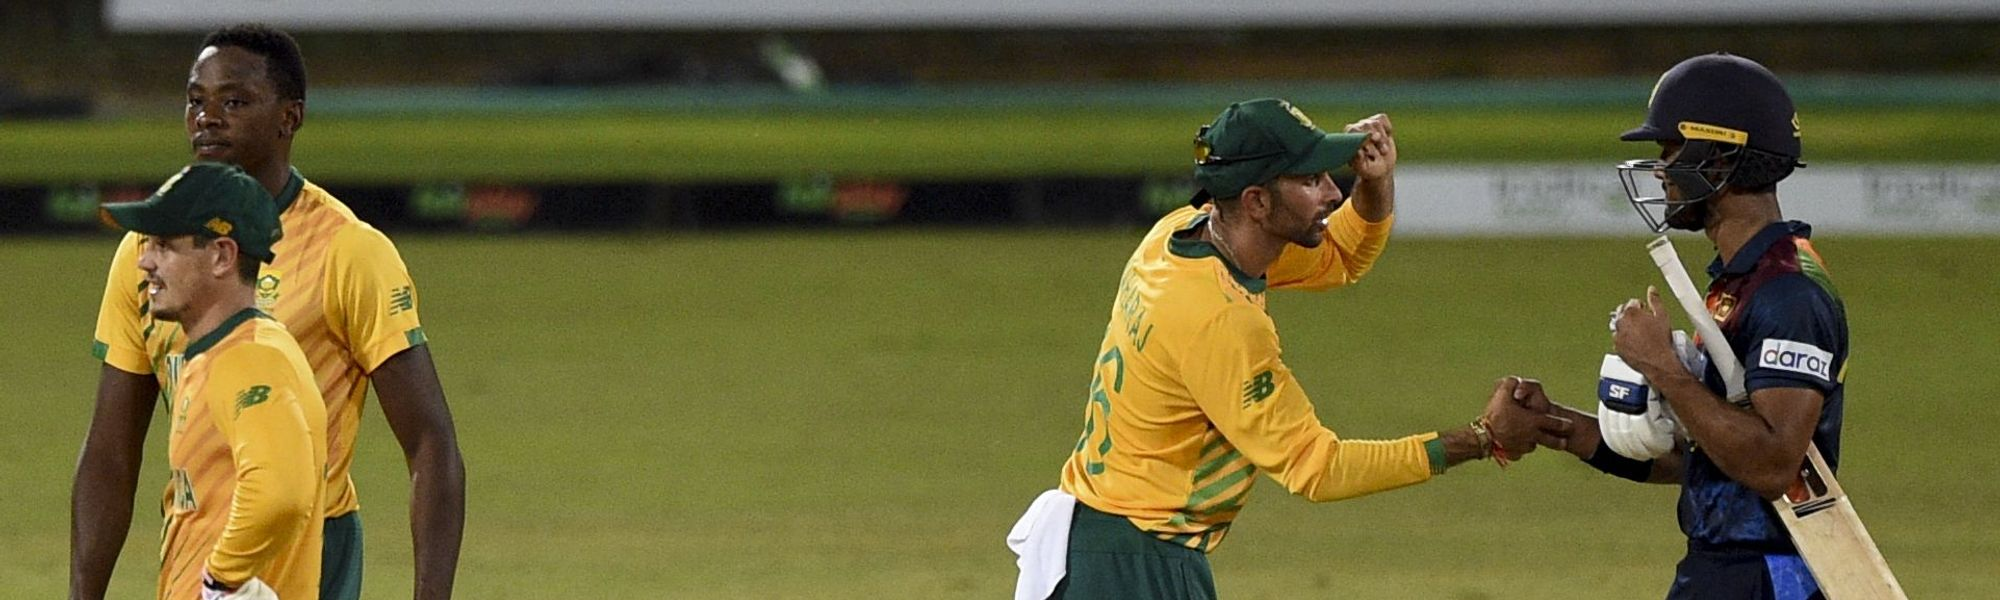 Sri Lanka vs South Africa, 2nd T20I